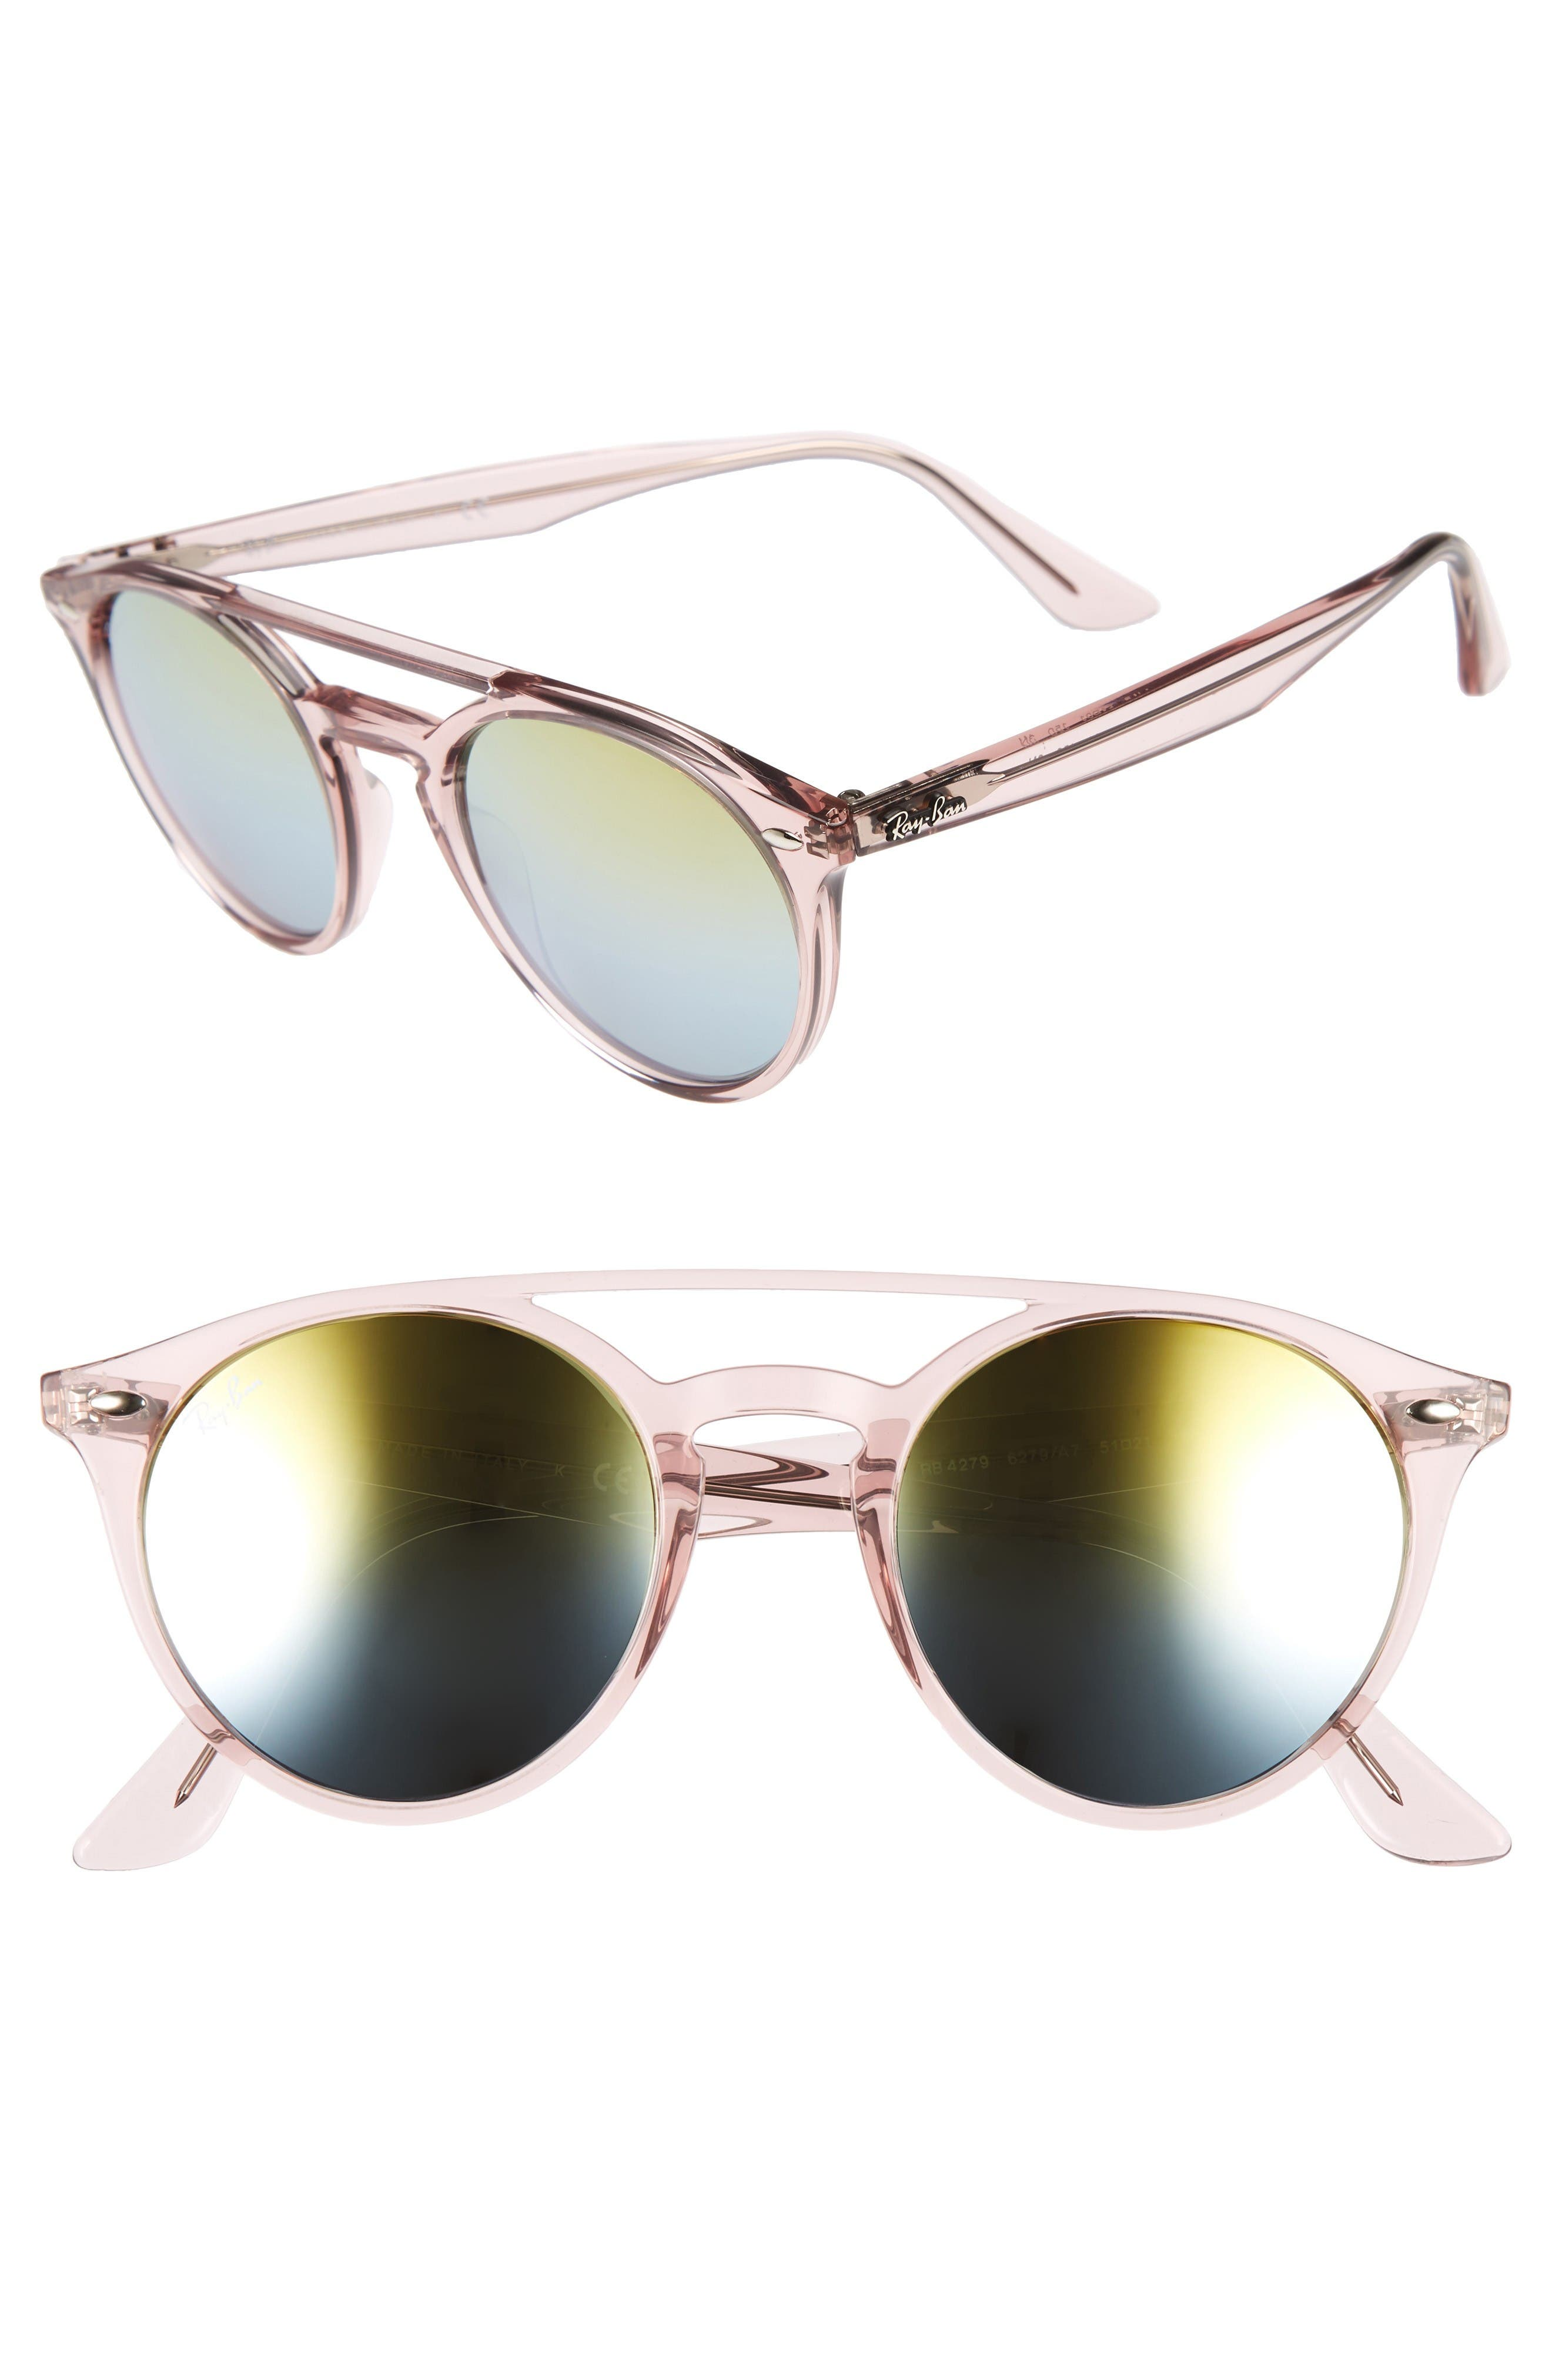 51mm Mirrored Rainbow Sunglasses,                         Main,                         color, Pink Rainbow